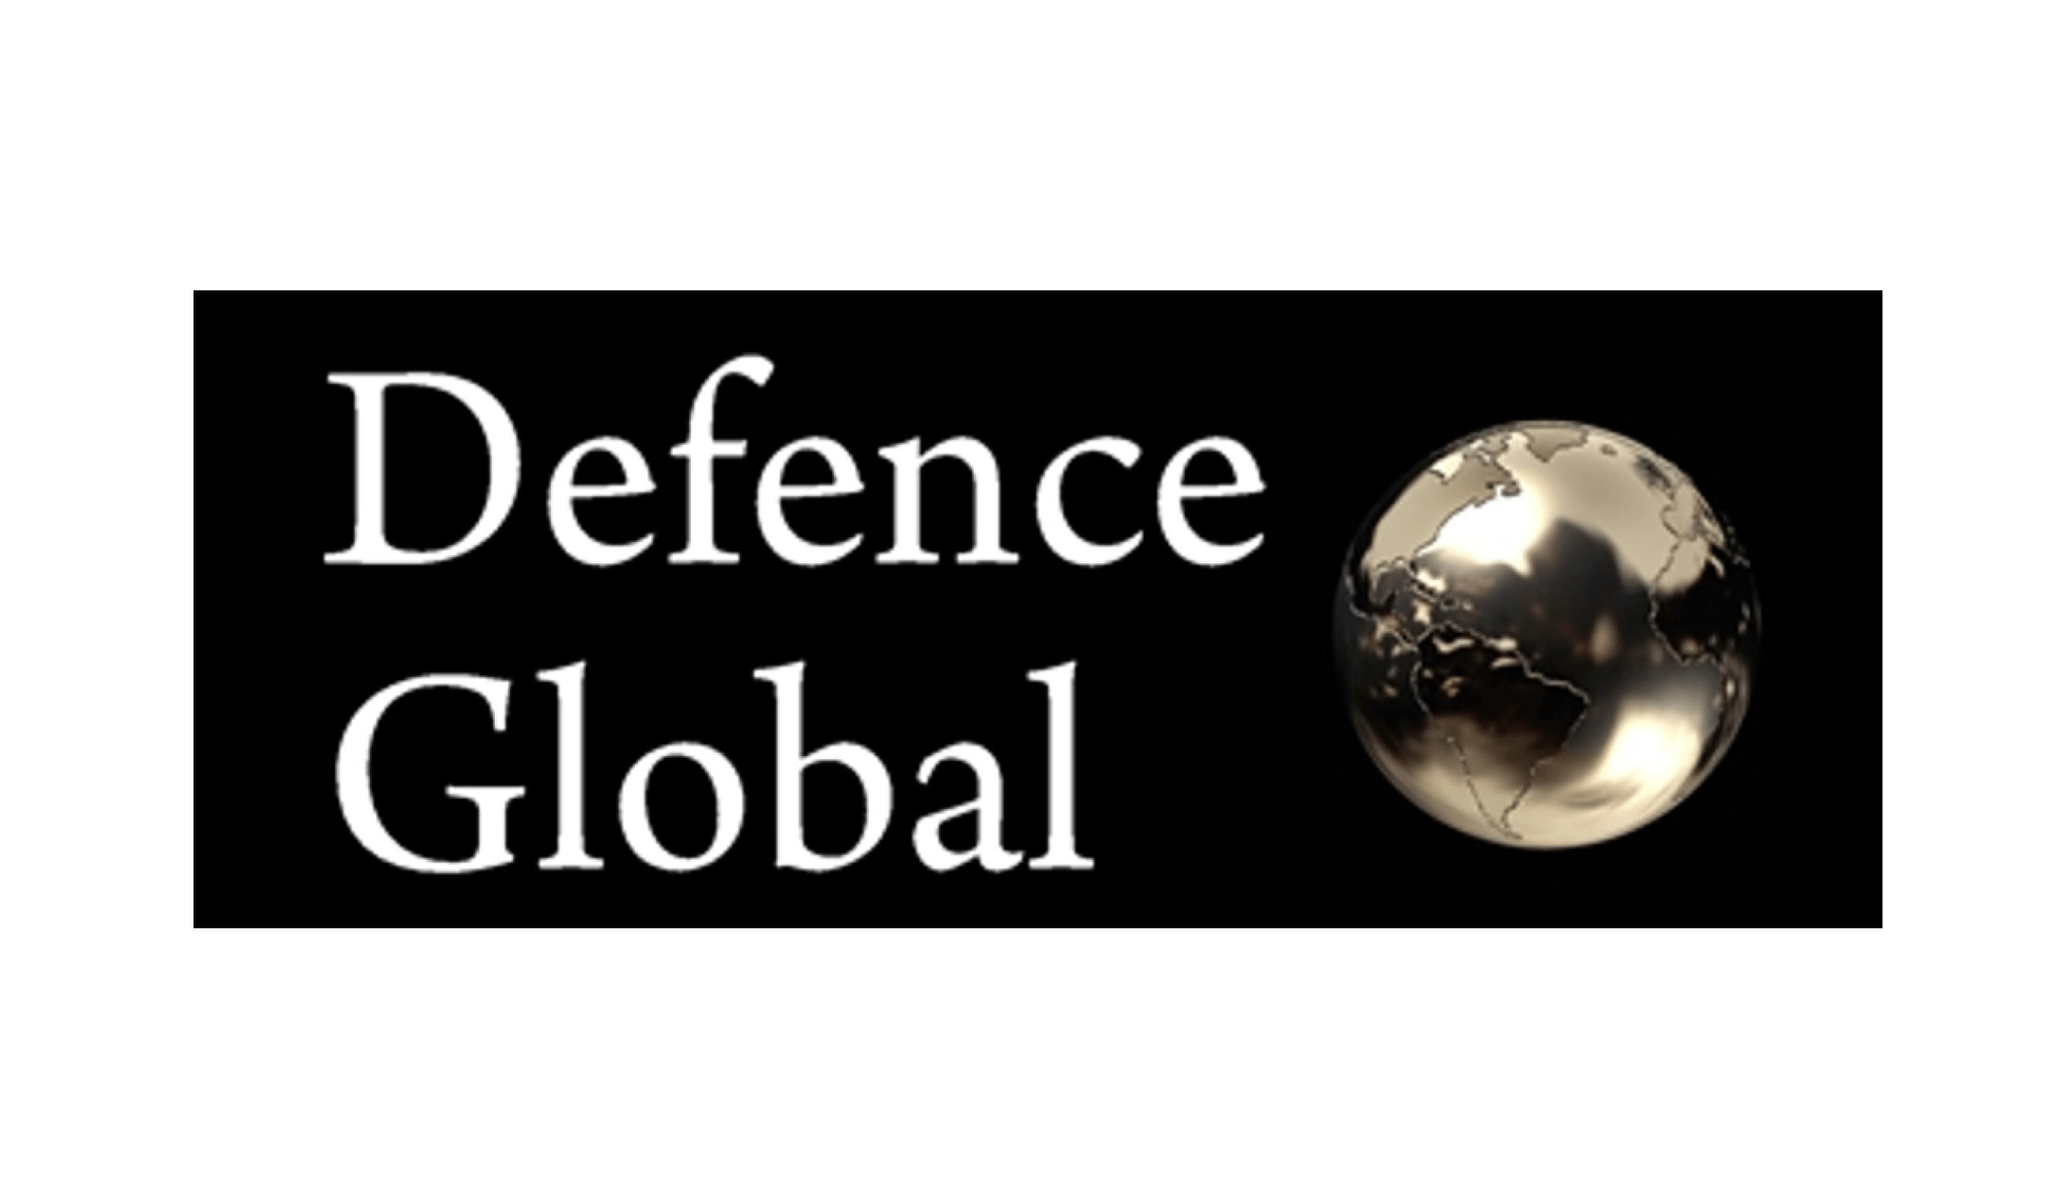 Defence Global